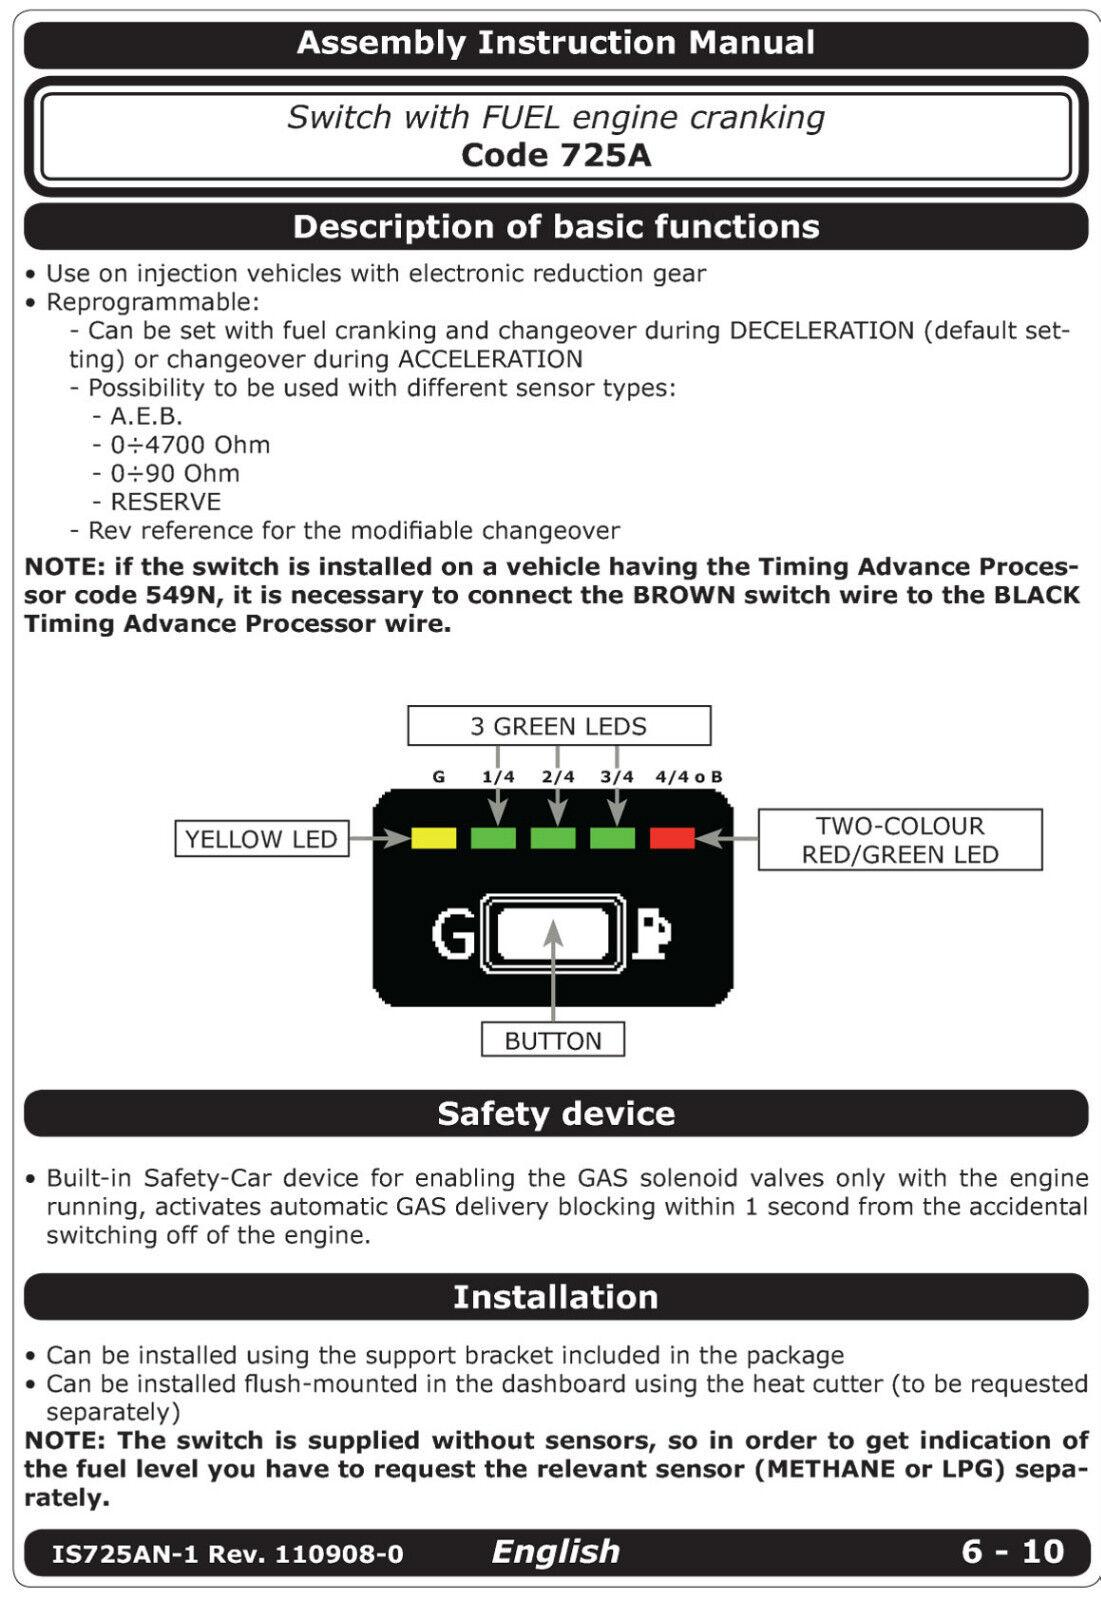 Automotive Lpg Wiring Diagram Free Download Wiring Diagram Xwiaw